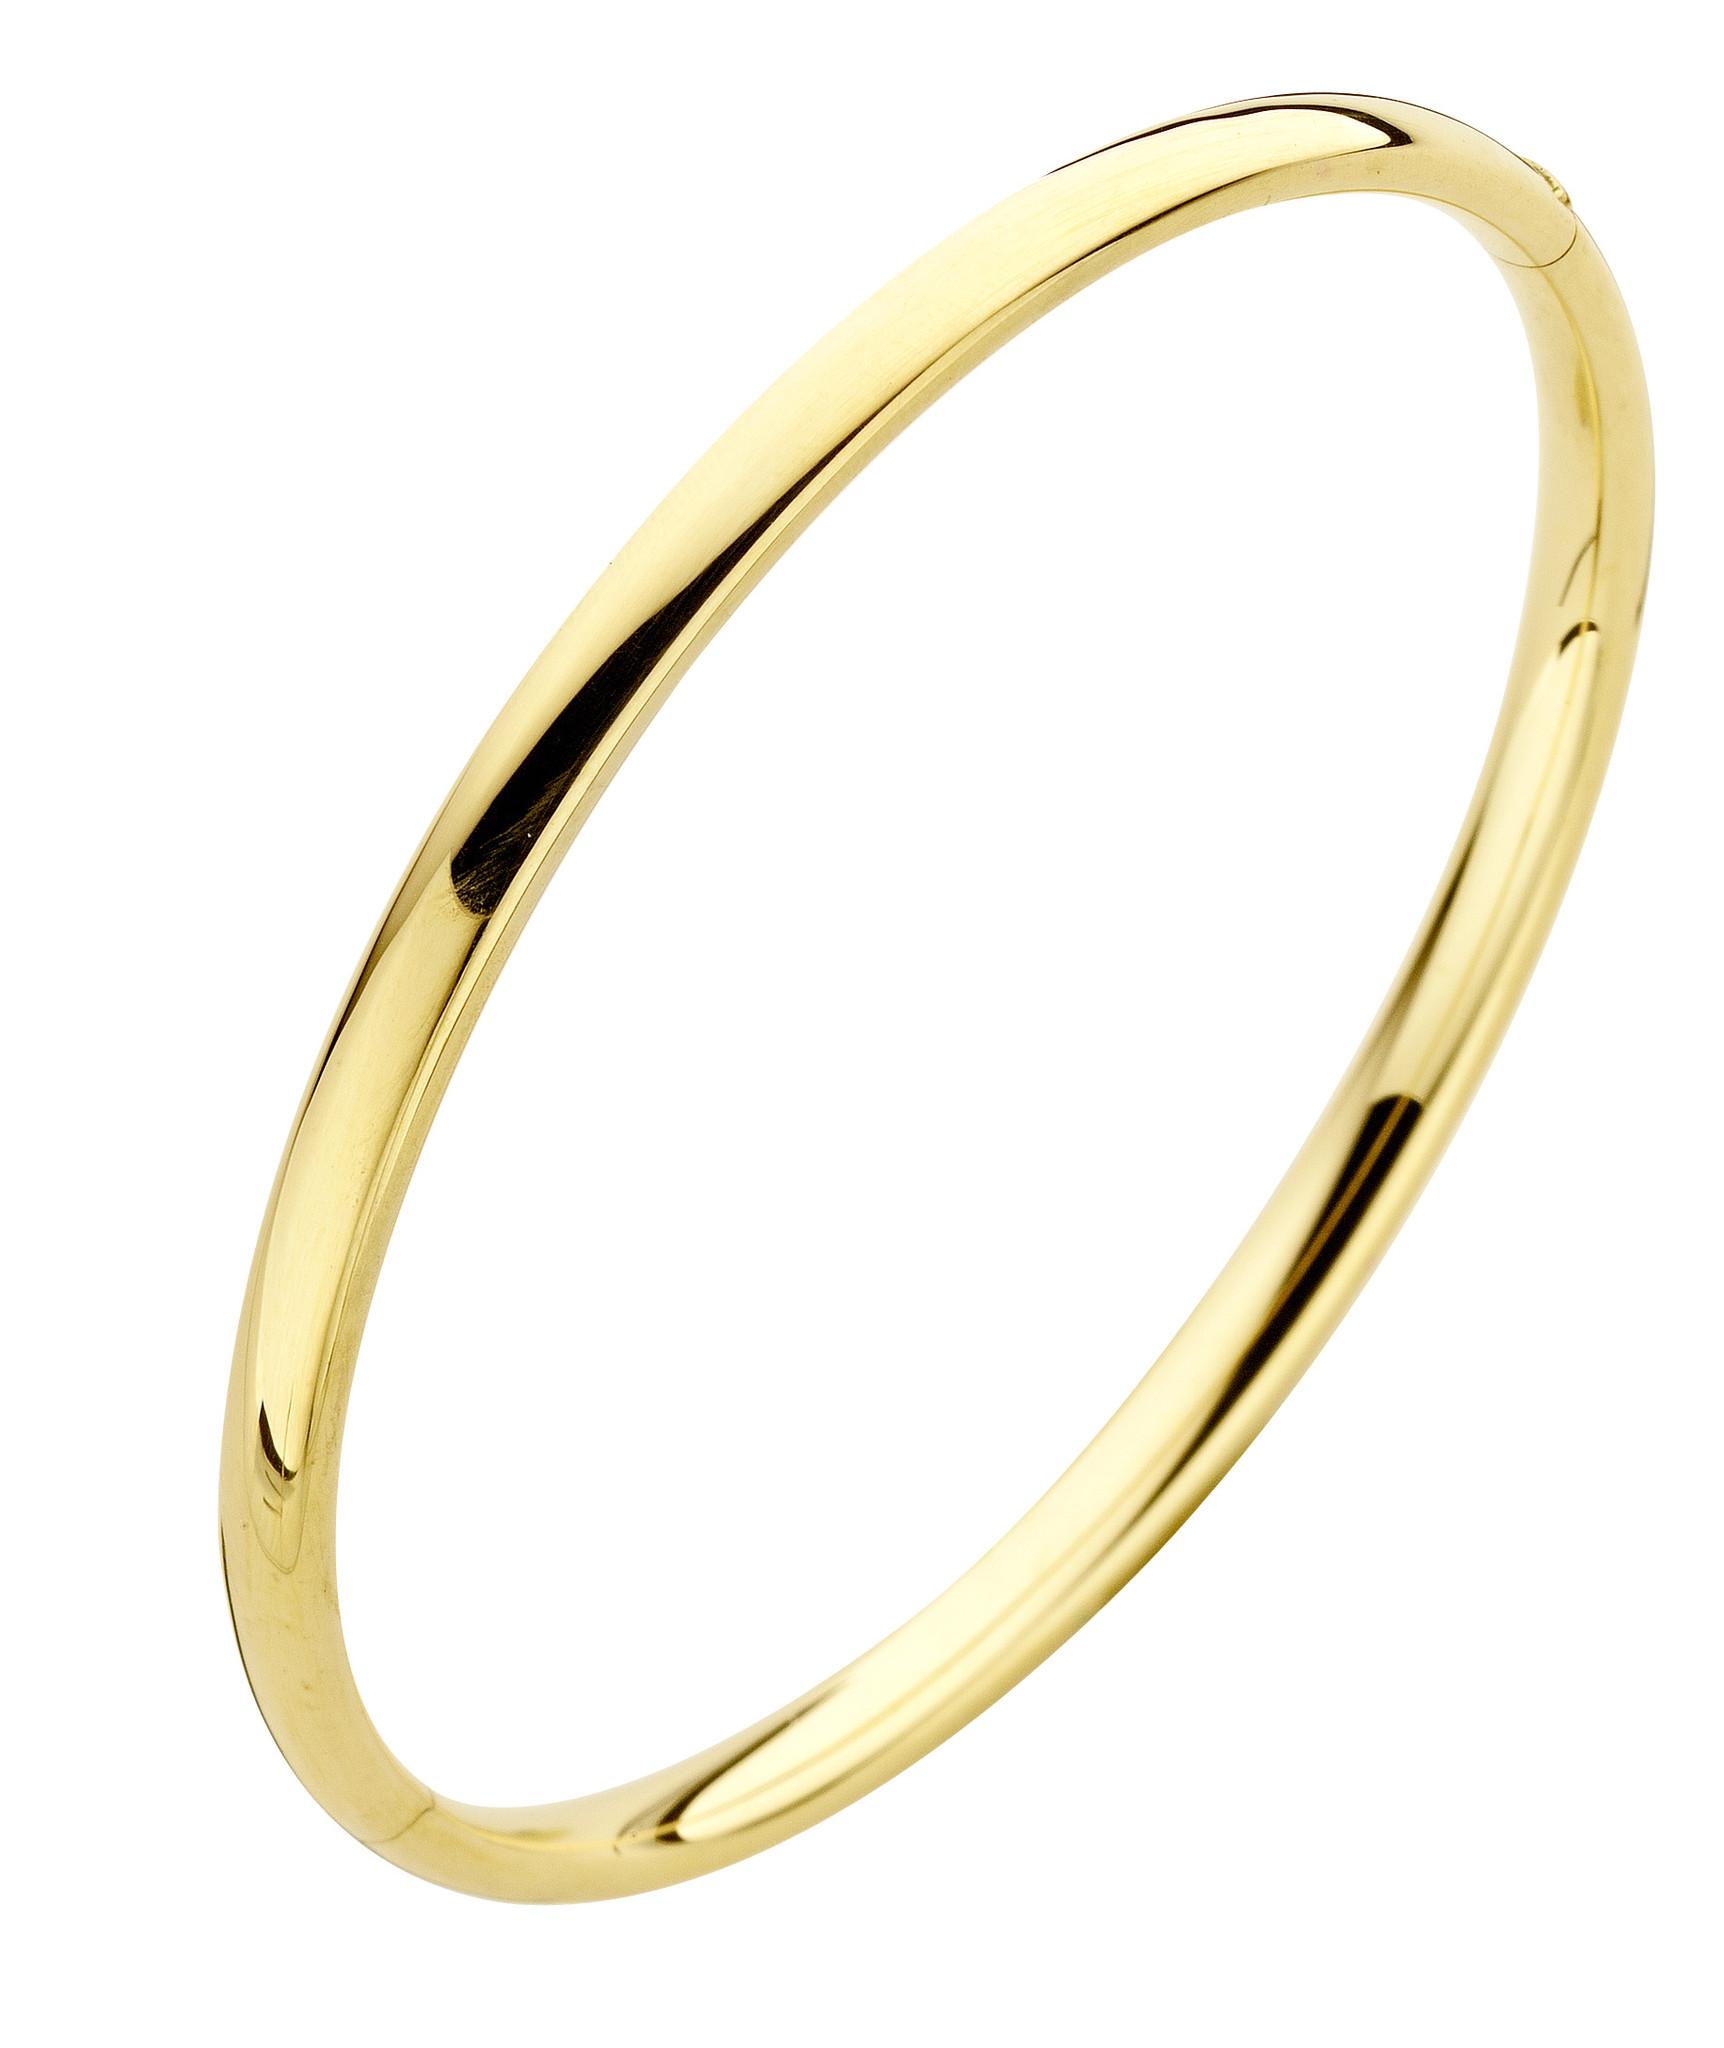 14 karaat geelgouden armband - Ovaal 5 mm - Fjory - Slavenarmband-1